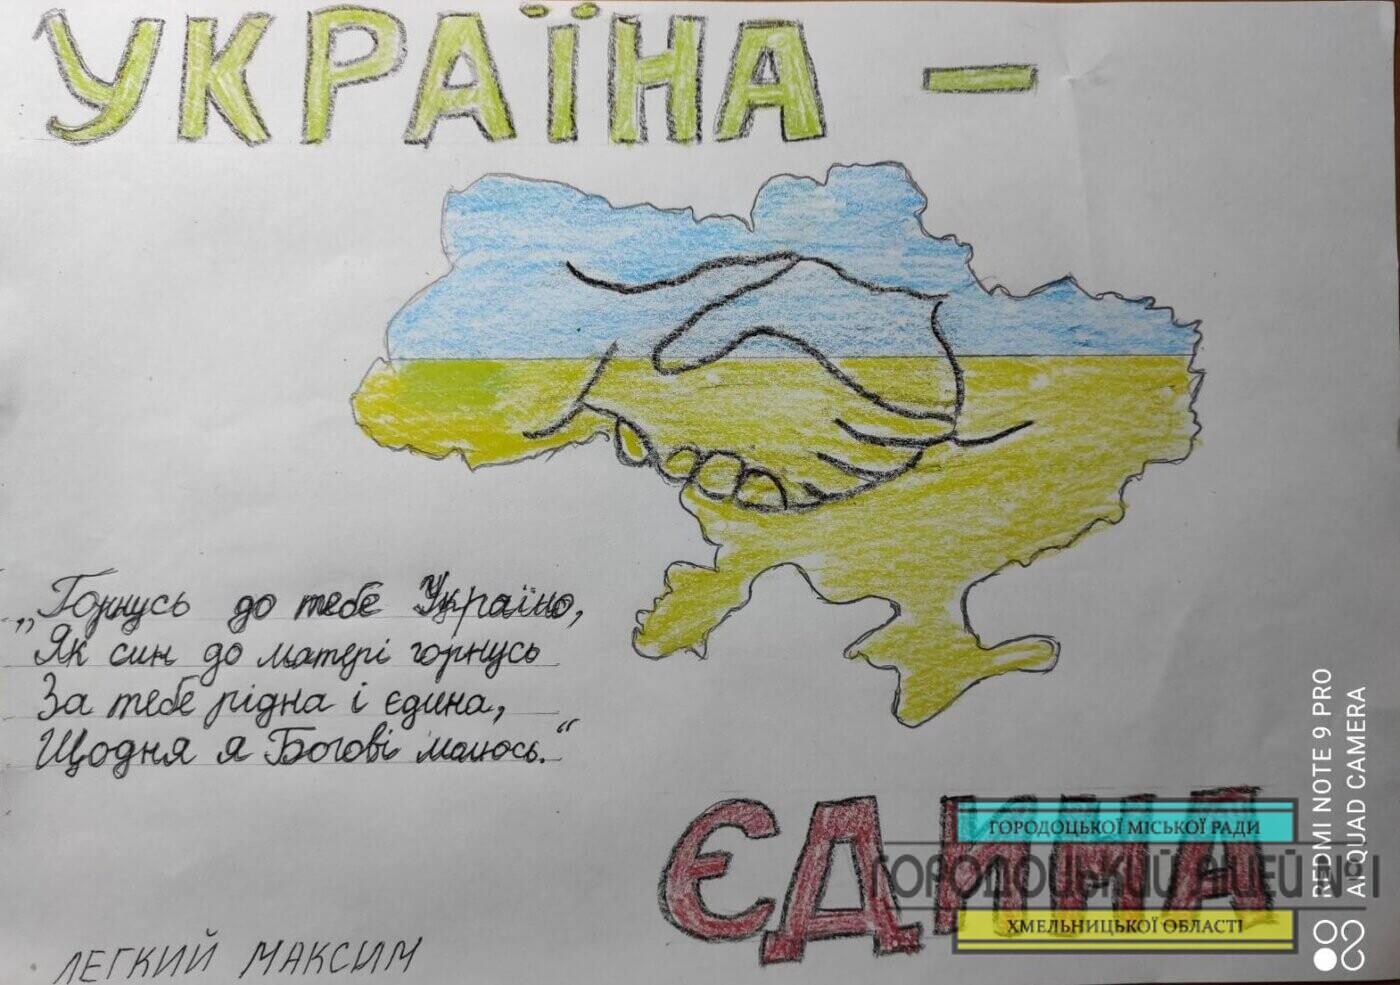 zobrazhennya viber 2021 01 25 13 52 09 1400x985 - Велична і Соборна, моя ти Україно!